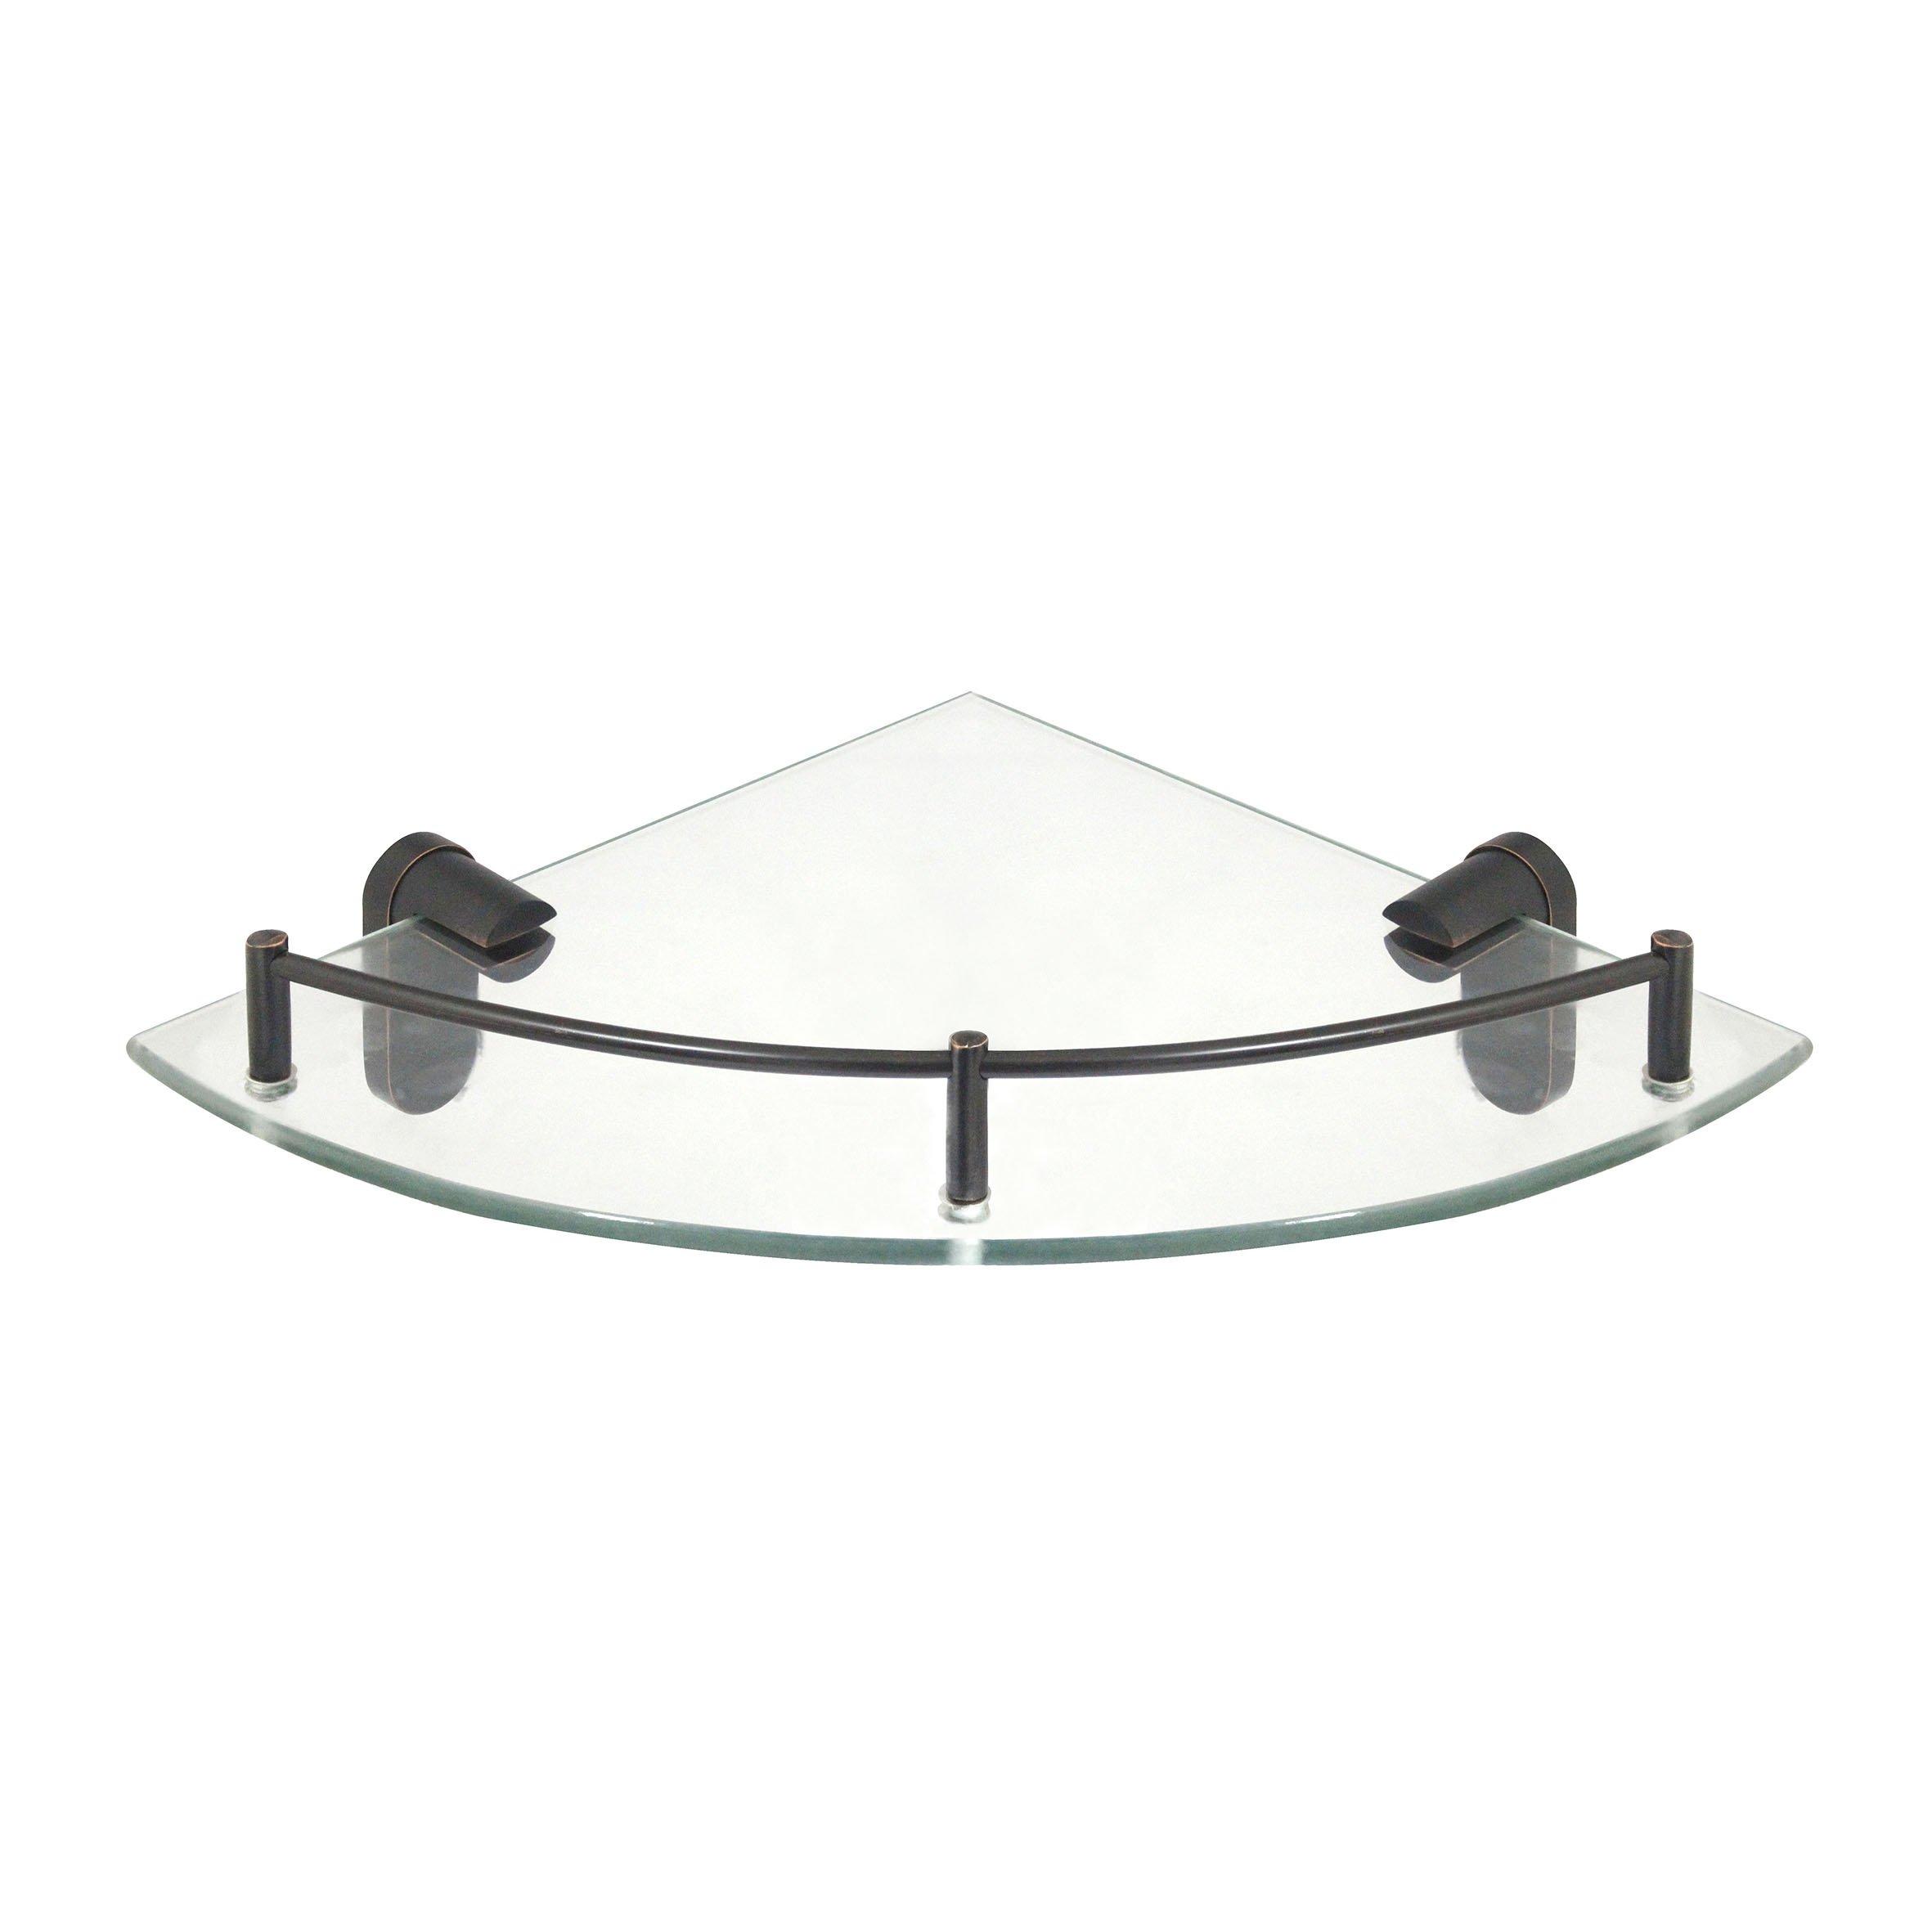 MODONA Corner Glass Shelf with Pre-installed Rail - RUBBED BRONZE - Oval Series - 5 Year Warrantee